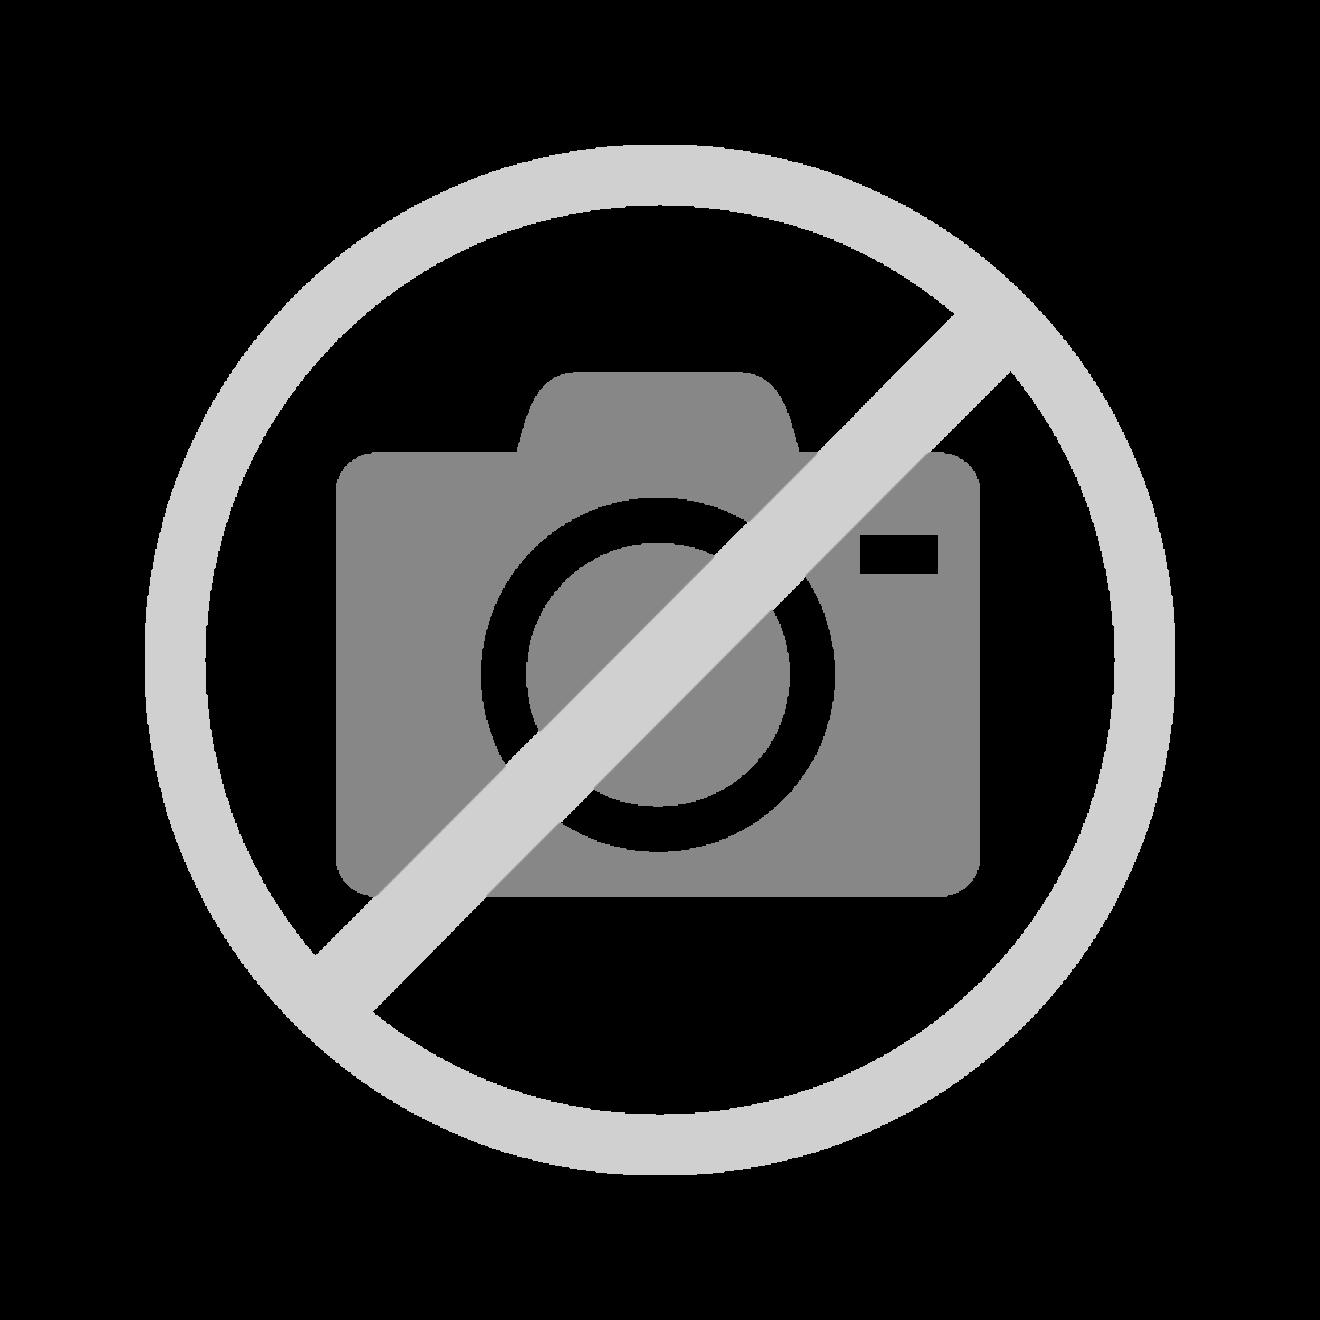 duschvorhangstange kreisform duschvorhangstange ring. Black Bedroom Furniture Sets. Home Design Ideas